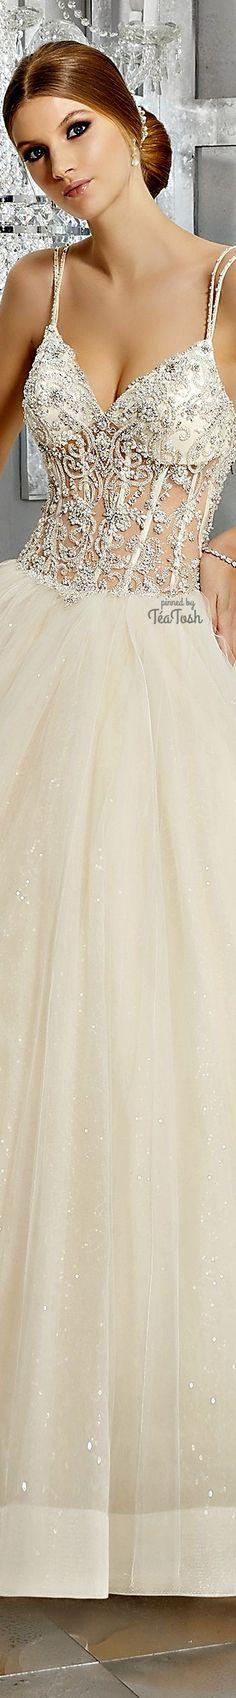 ❇Téa Tosh❇ (Front) Midori Wedding Dress Romantic Princess, Princess Wedding, Disney Wedding Dresses, Weeding Dresses, Formal Dresses, Older Bride, Sophisticated Wedding, Bridal Beauty, Dream Wedding